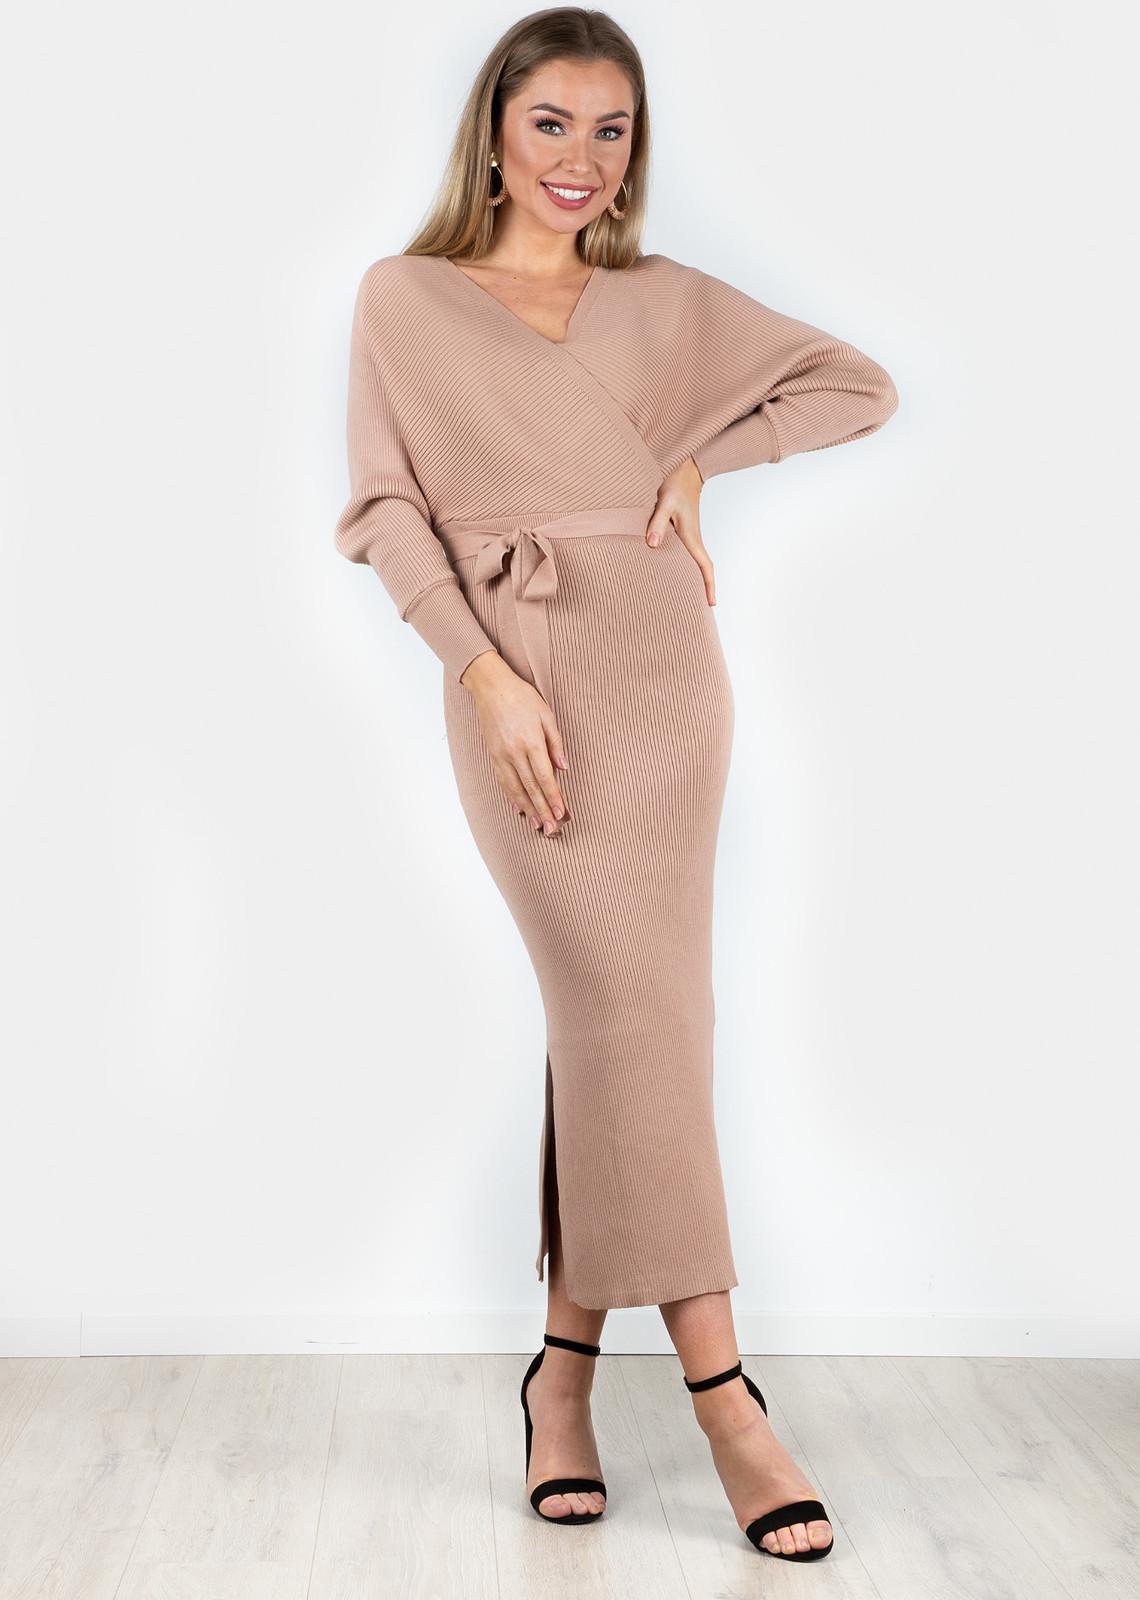 Dress Tara beige